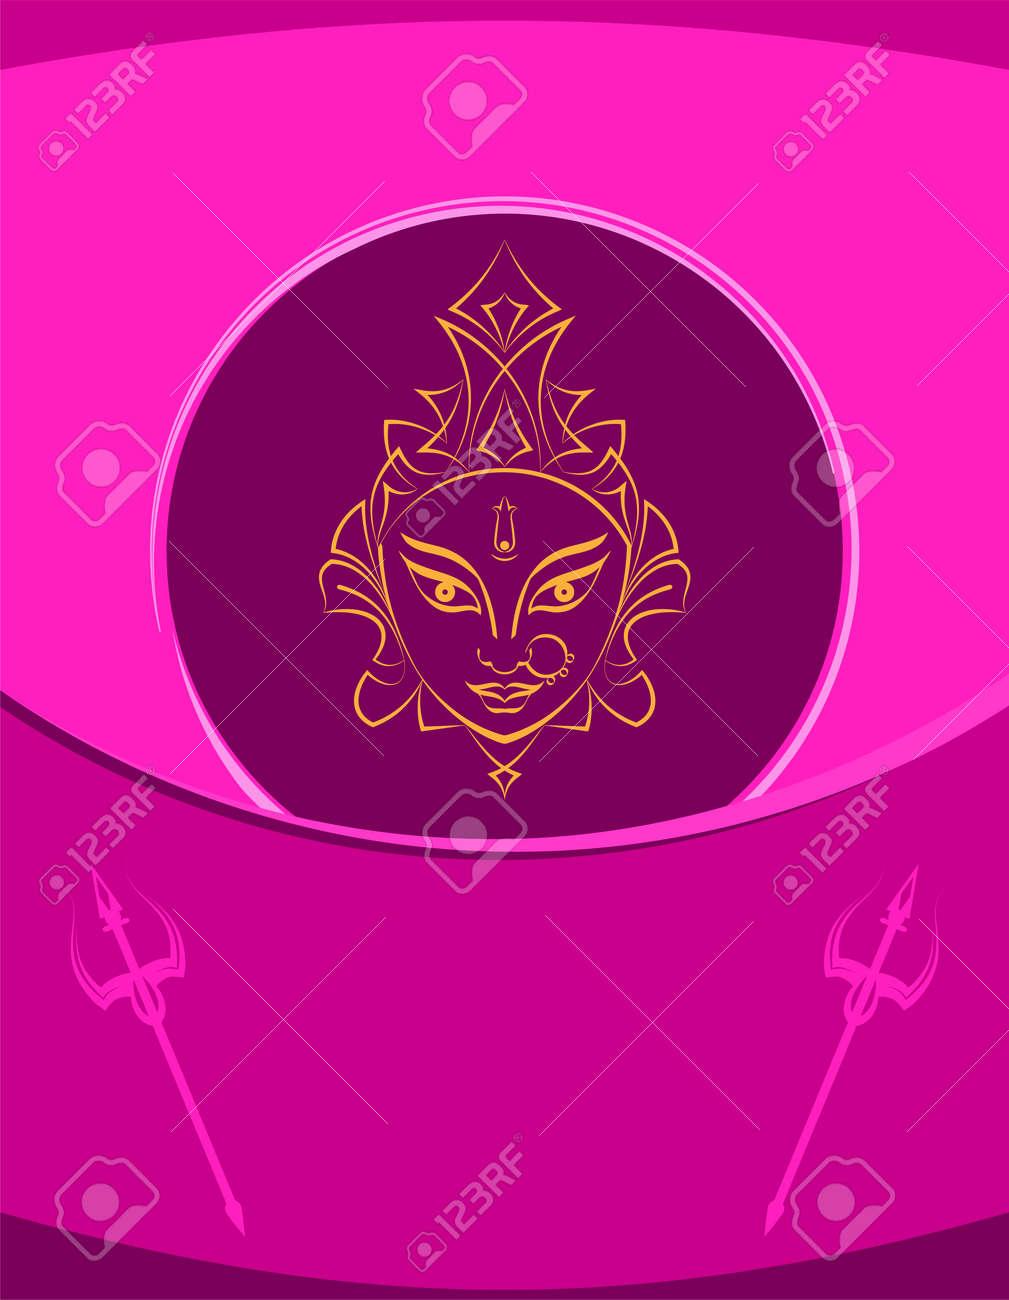 Durga Goddess Of Power, Divine Mother Of The Universe Design